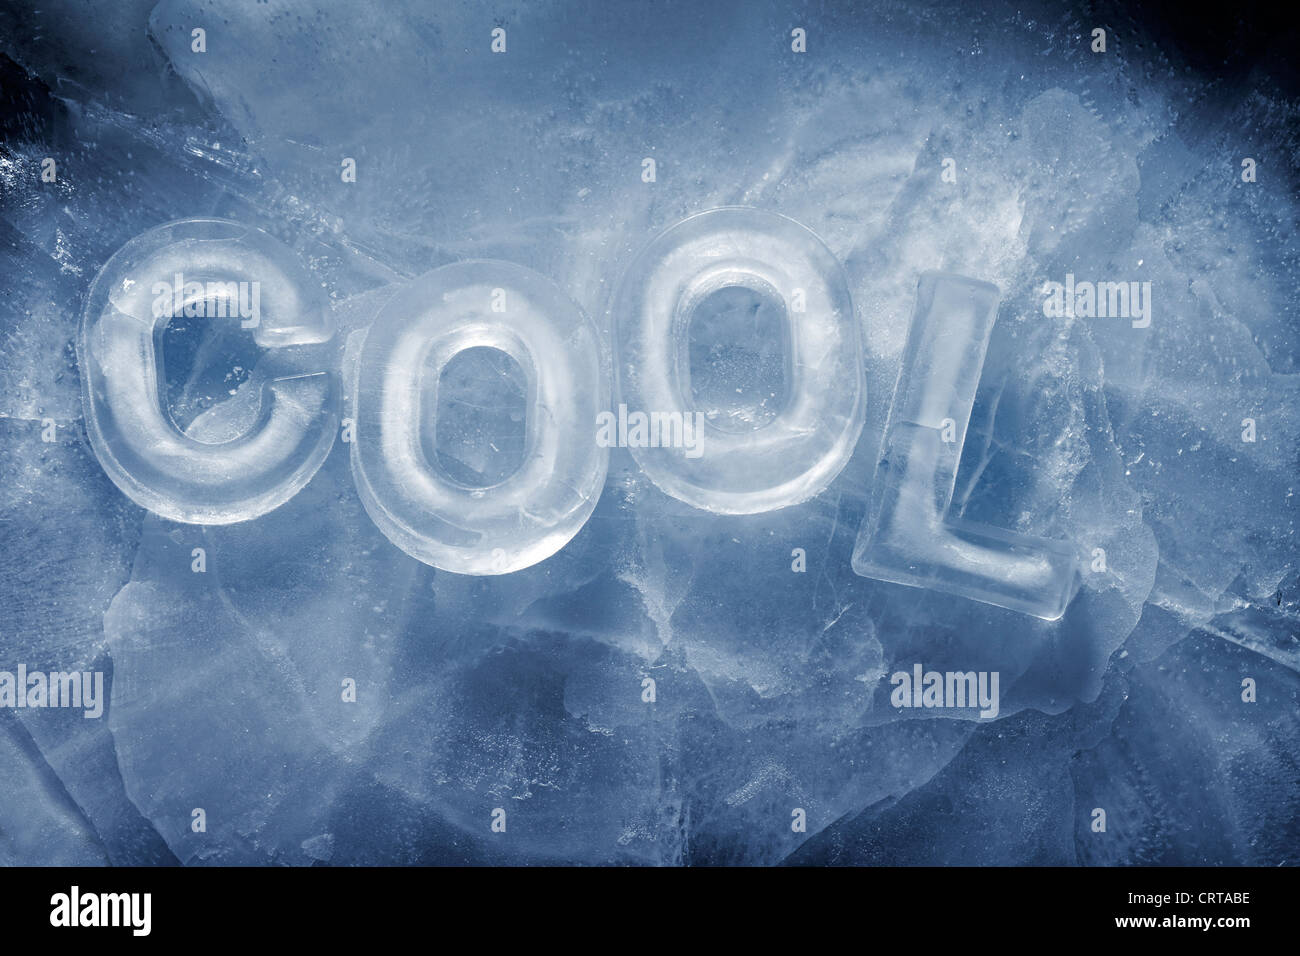 "Wort ""Cool"" mit echtem Eis Briefe geschrieben. Stockbild"